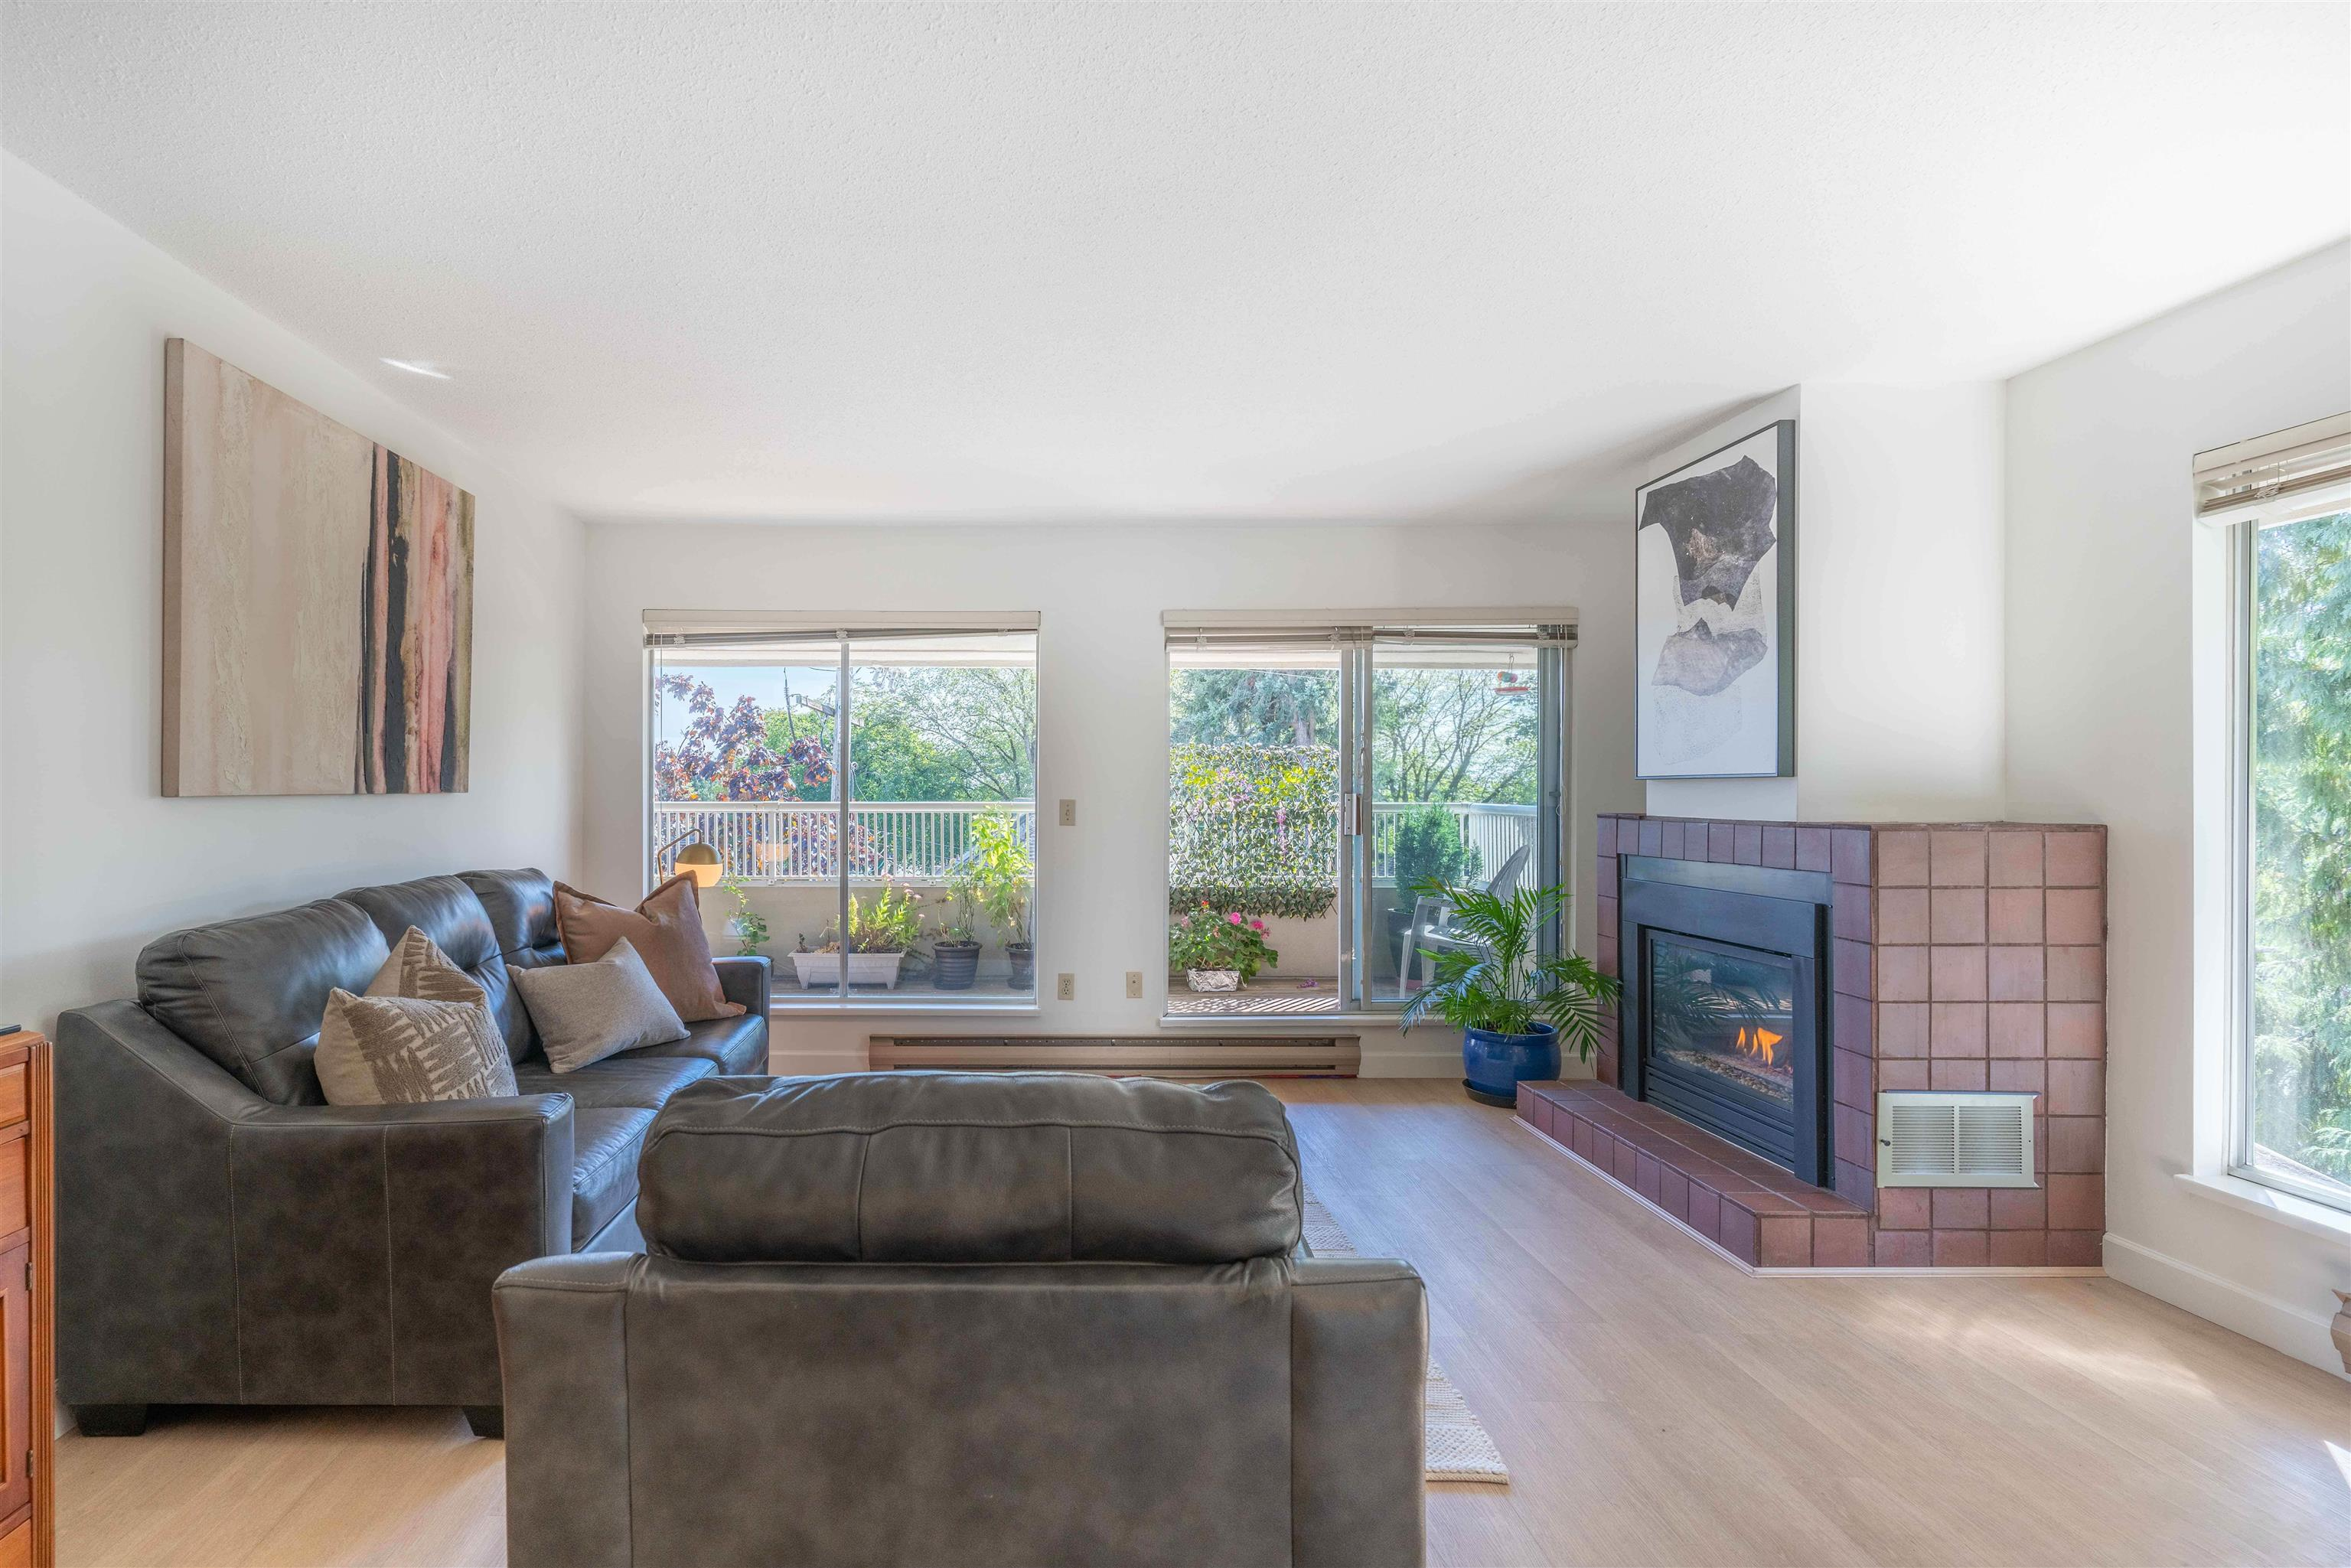 203 3626 W 28TH AVENUE - Dunbar Apartment/Condo for sale, 2 Bedrooms (R2619922)